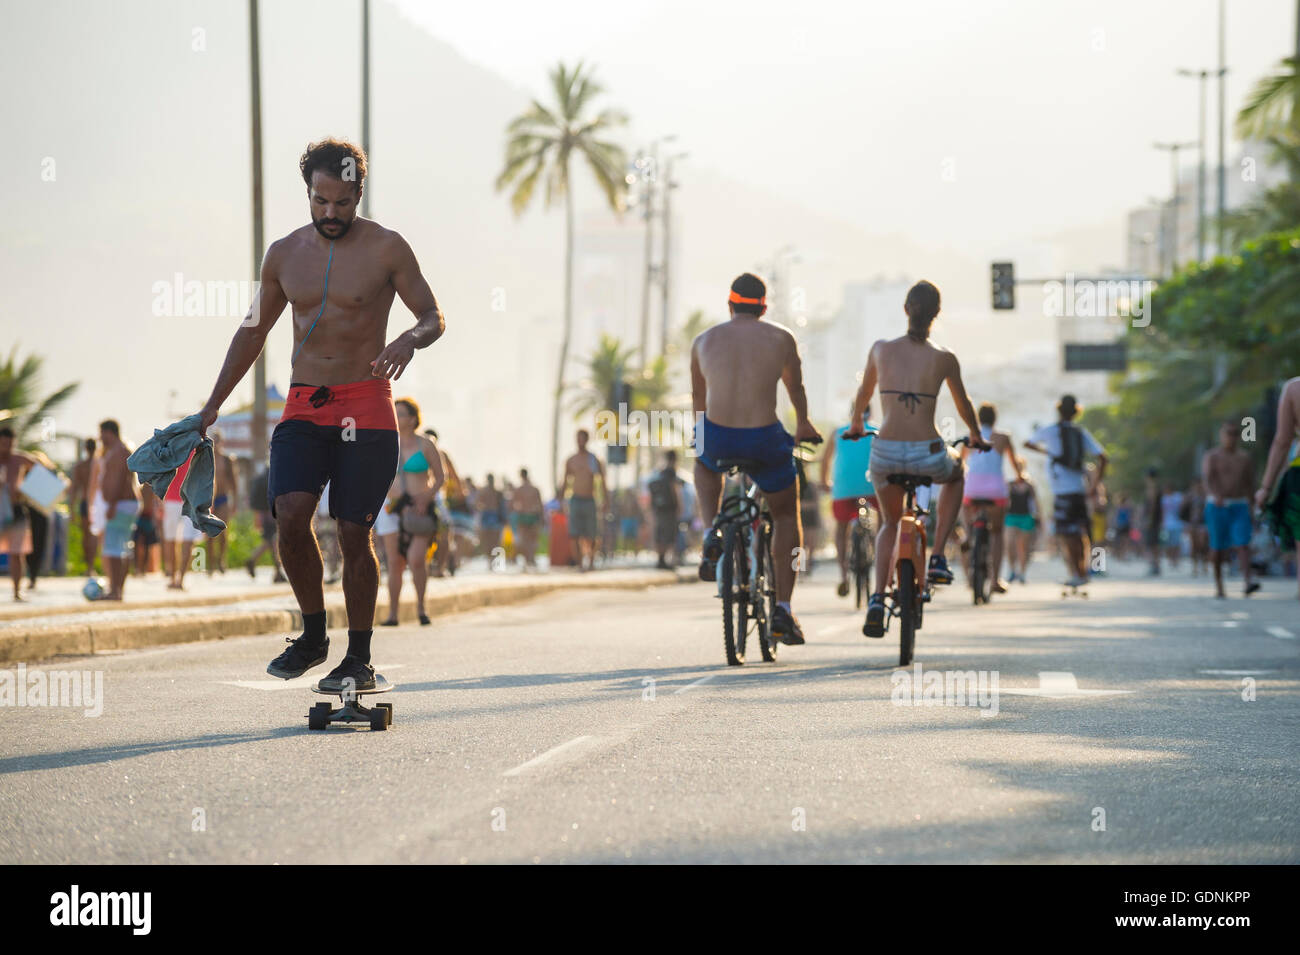 RIO DE JANEIRO - MARCH 6, 2016: Residents take advantage of a car-free Sunday afternoon on the beachfront Avenida - Stock Image